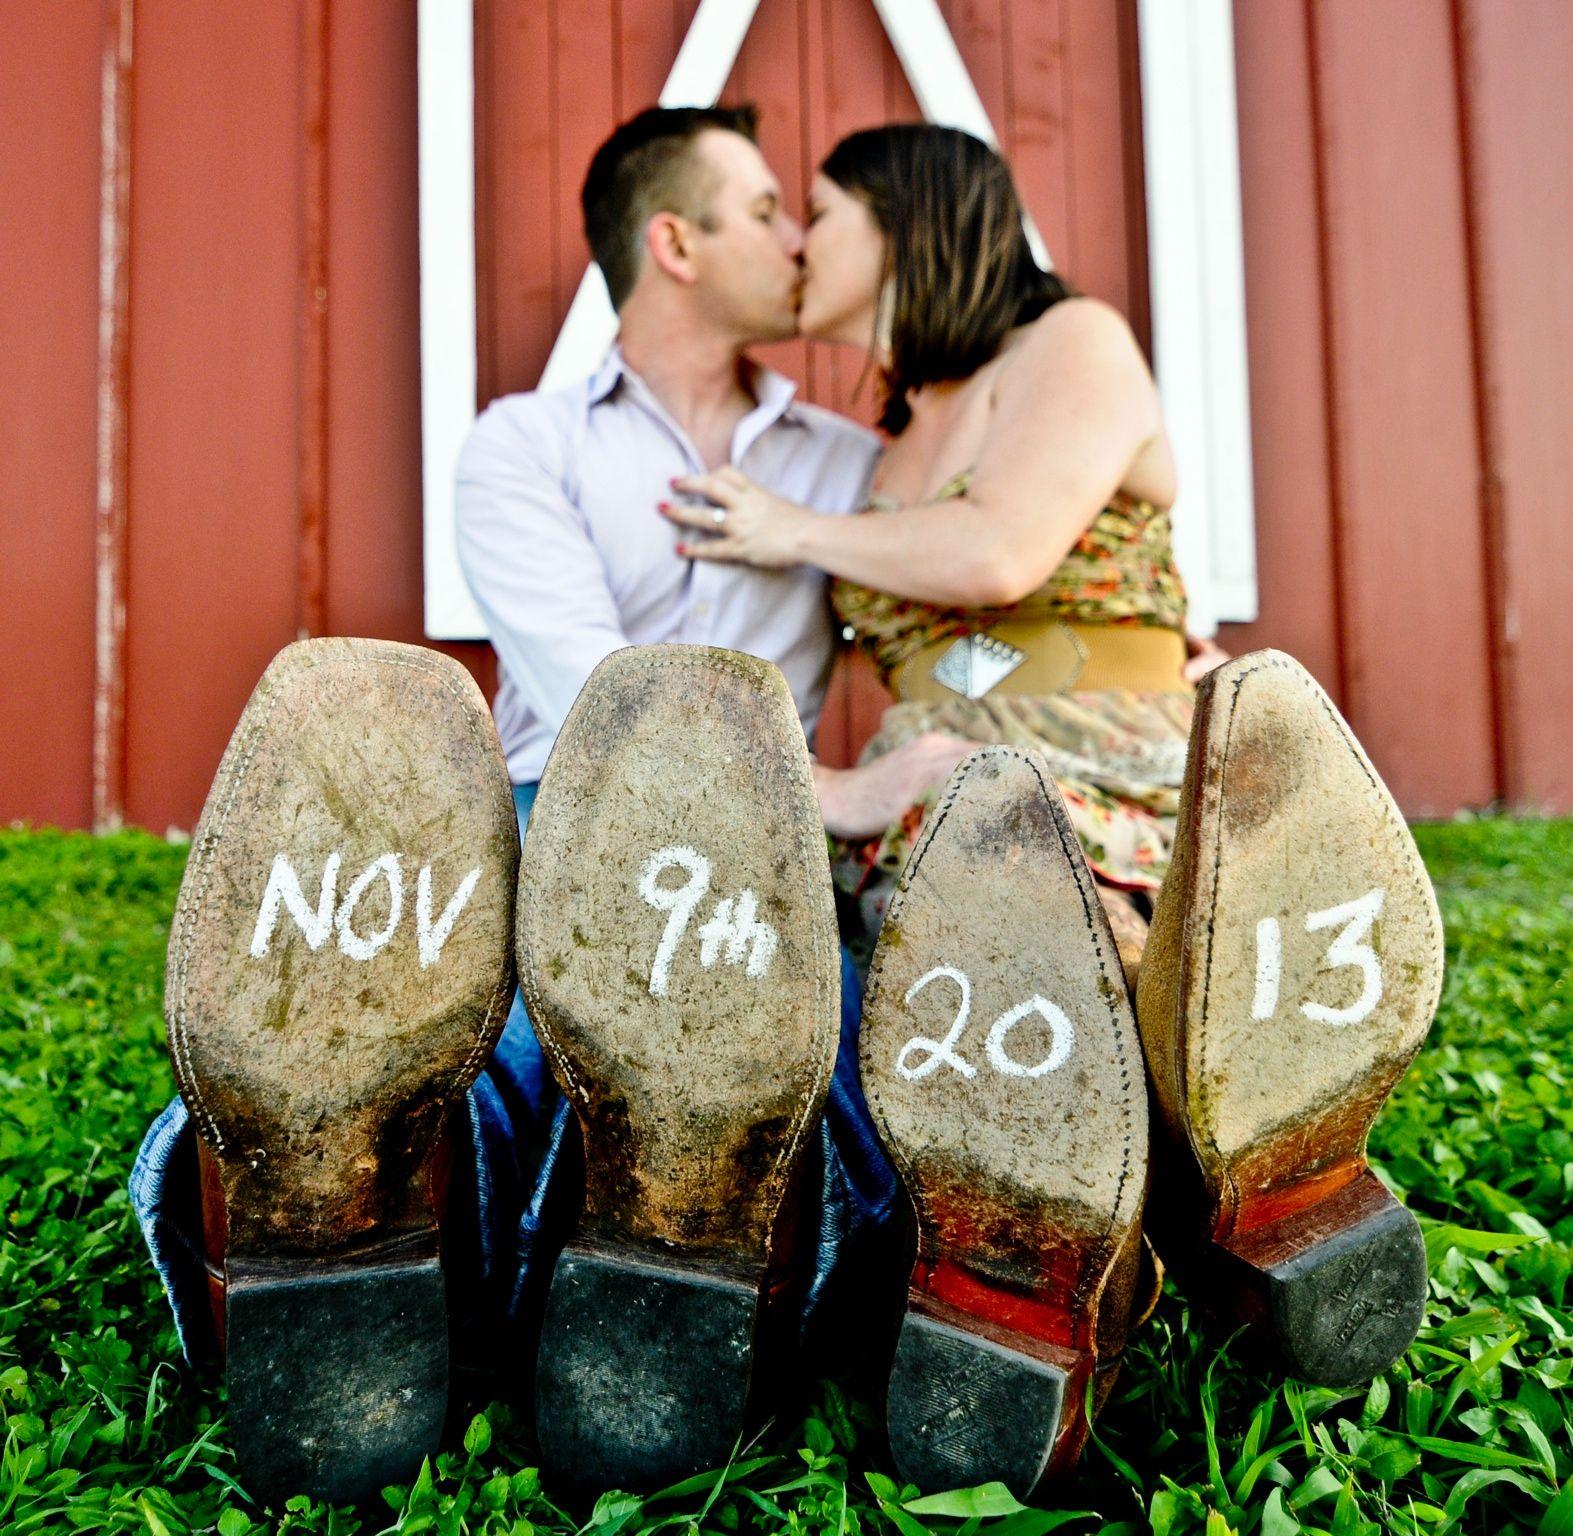 Cowgirl Wedding Ideas: Save The Date Wedding Invitation Card Idea. Writing Your